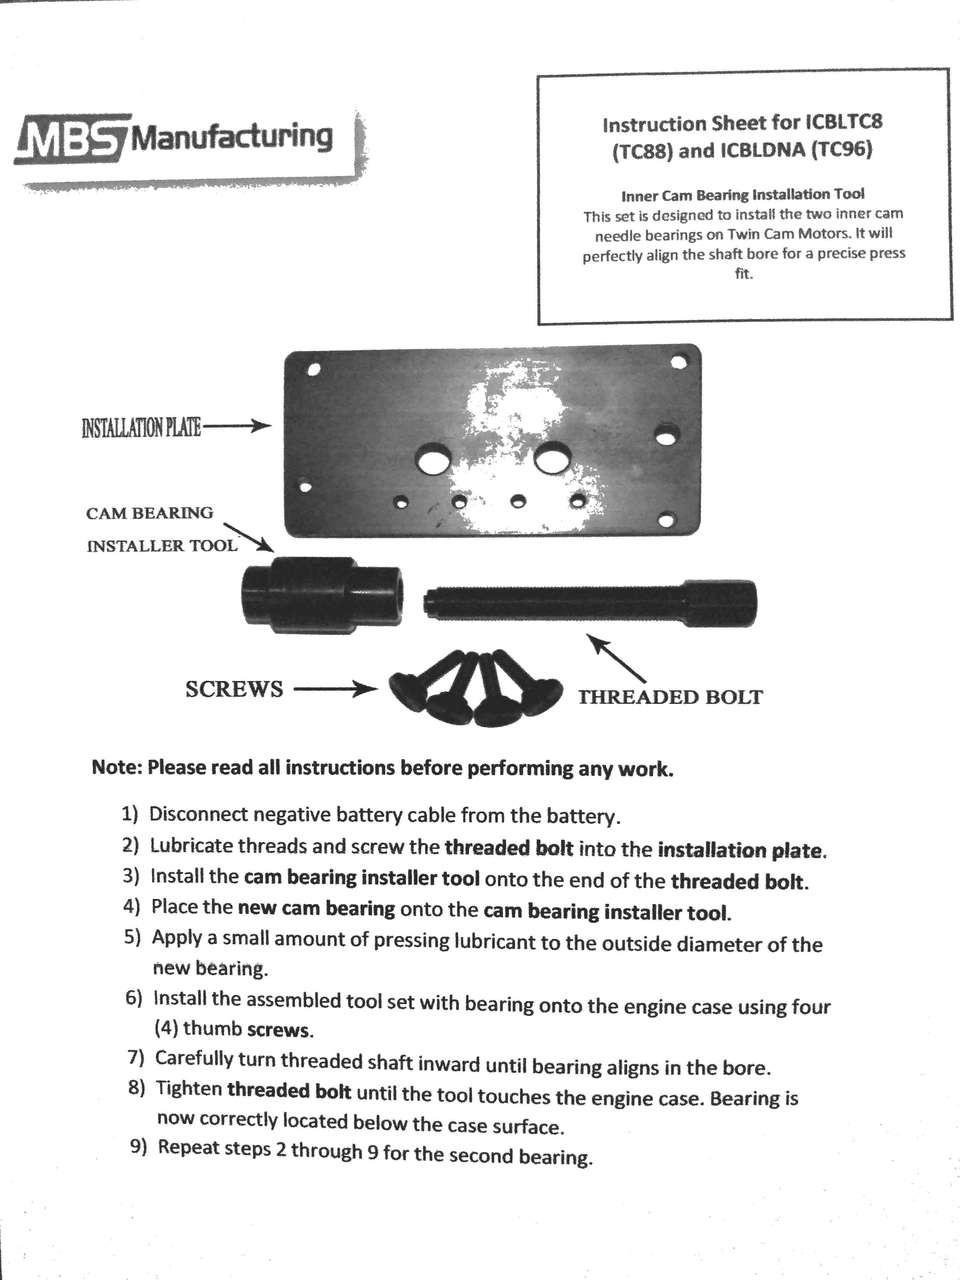 Harley Davidson TC 96 103 110 Dyna Twin Inner Cam Bearing Tools + B168 Bearings